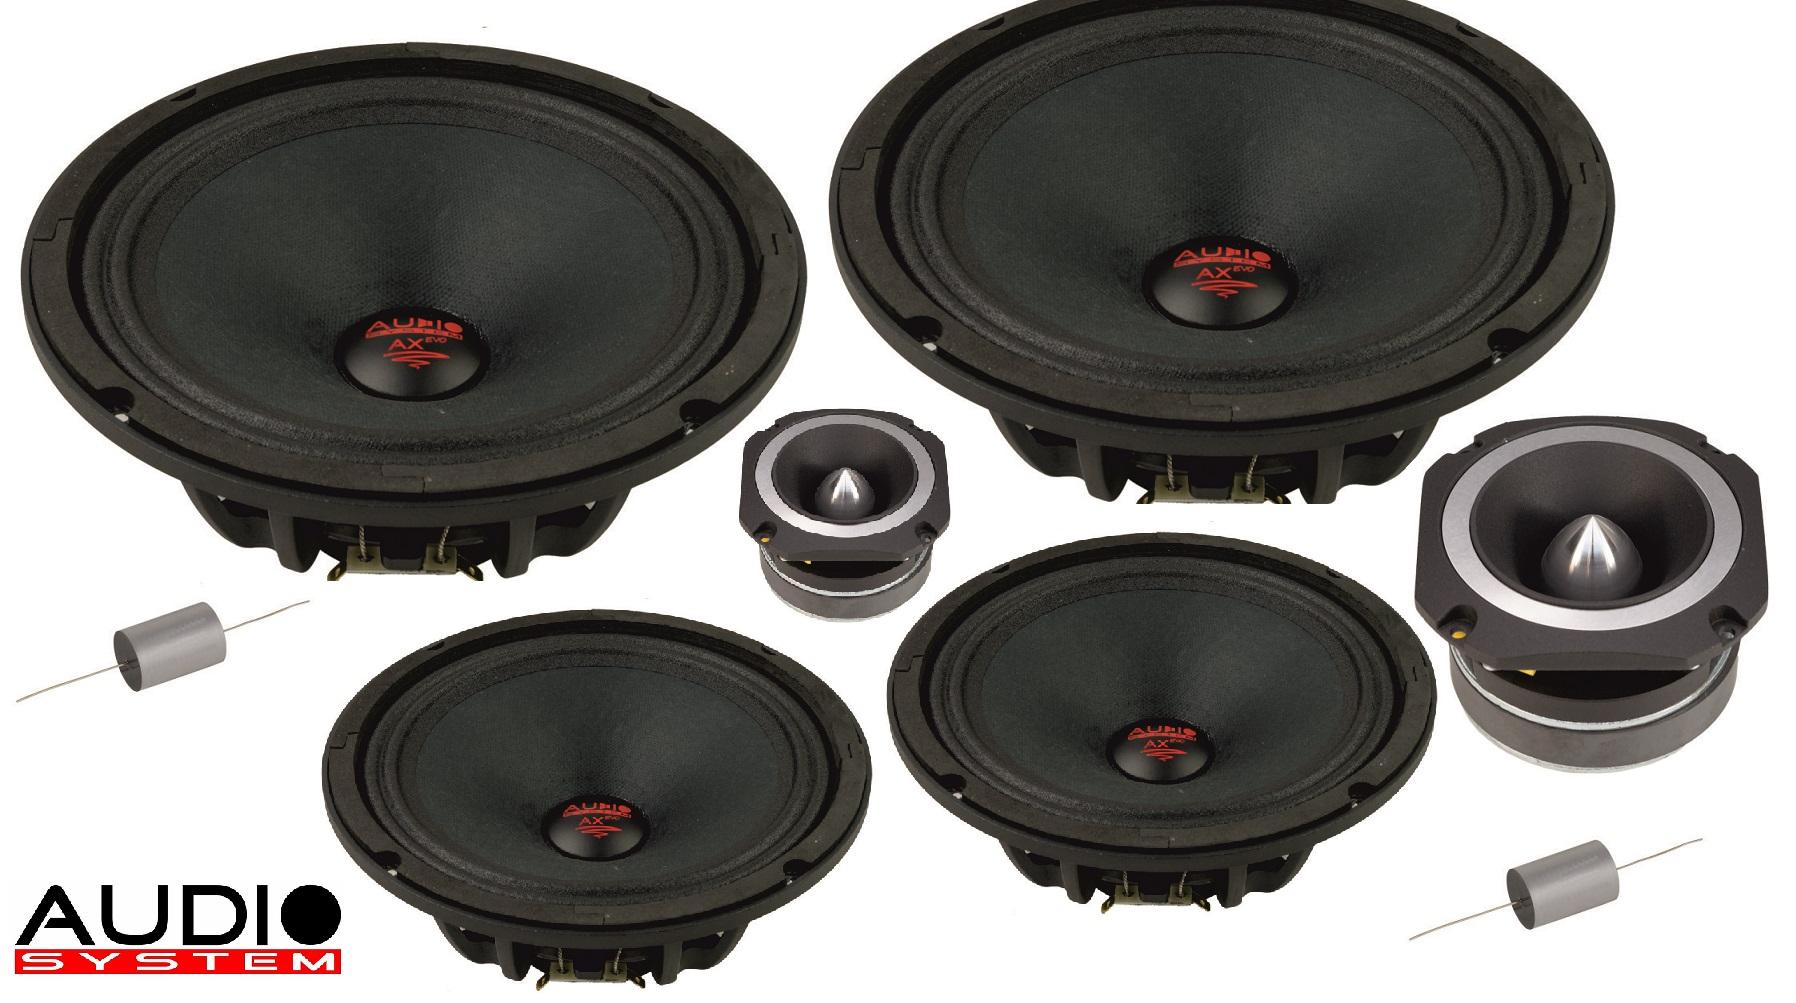 Audio System H 200 PA-4 Helon SERIES PA 20cm 2-Wege NEO Doppelkomposystem 1600 Watt